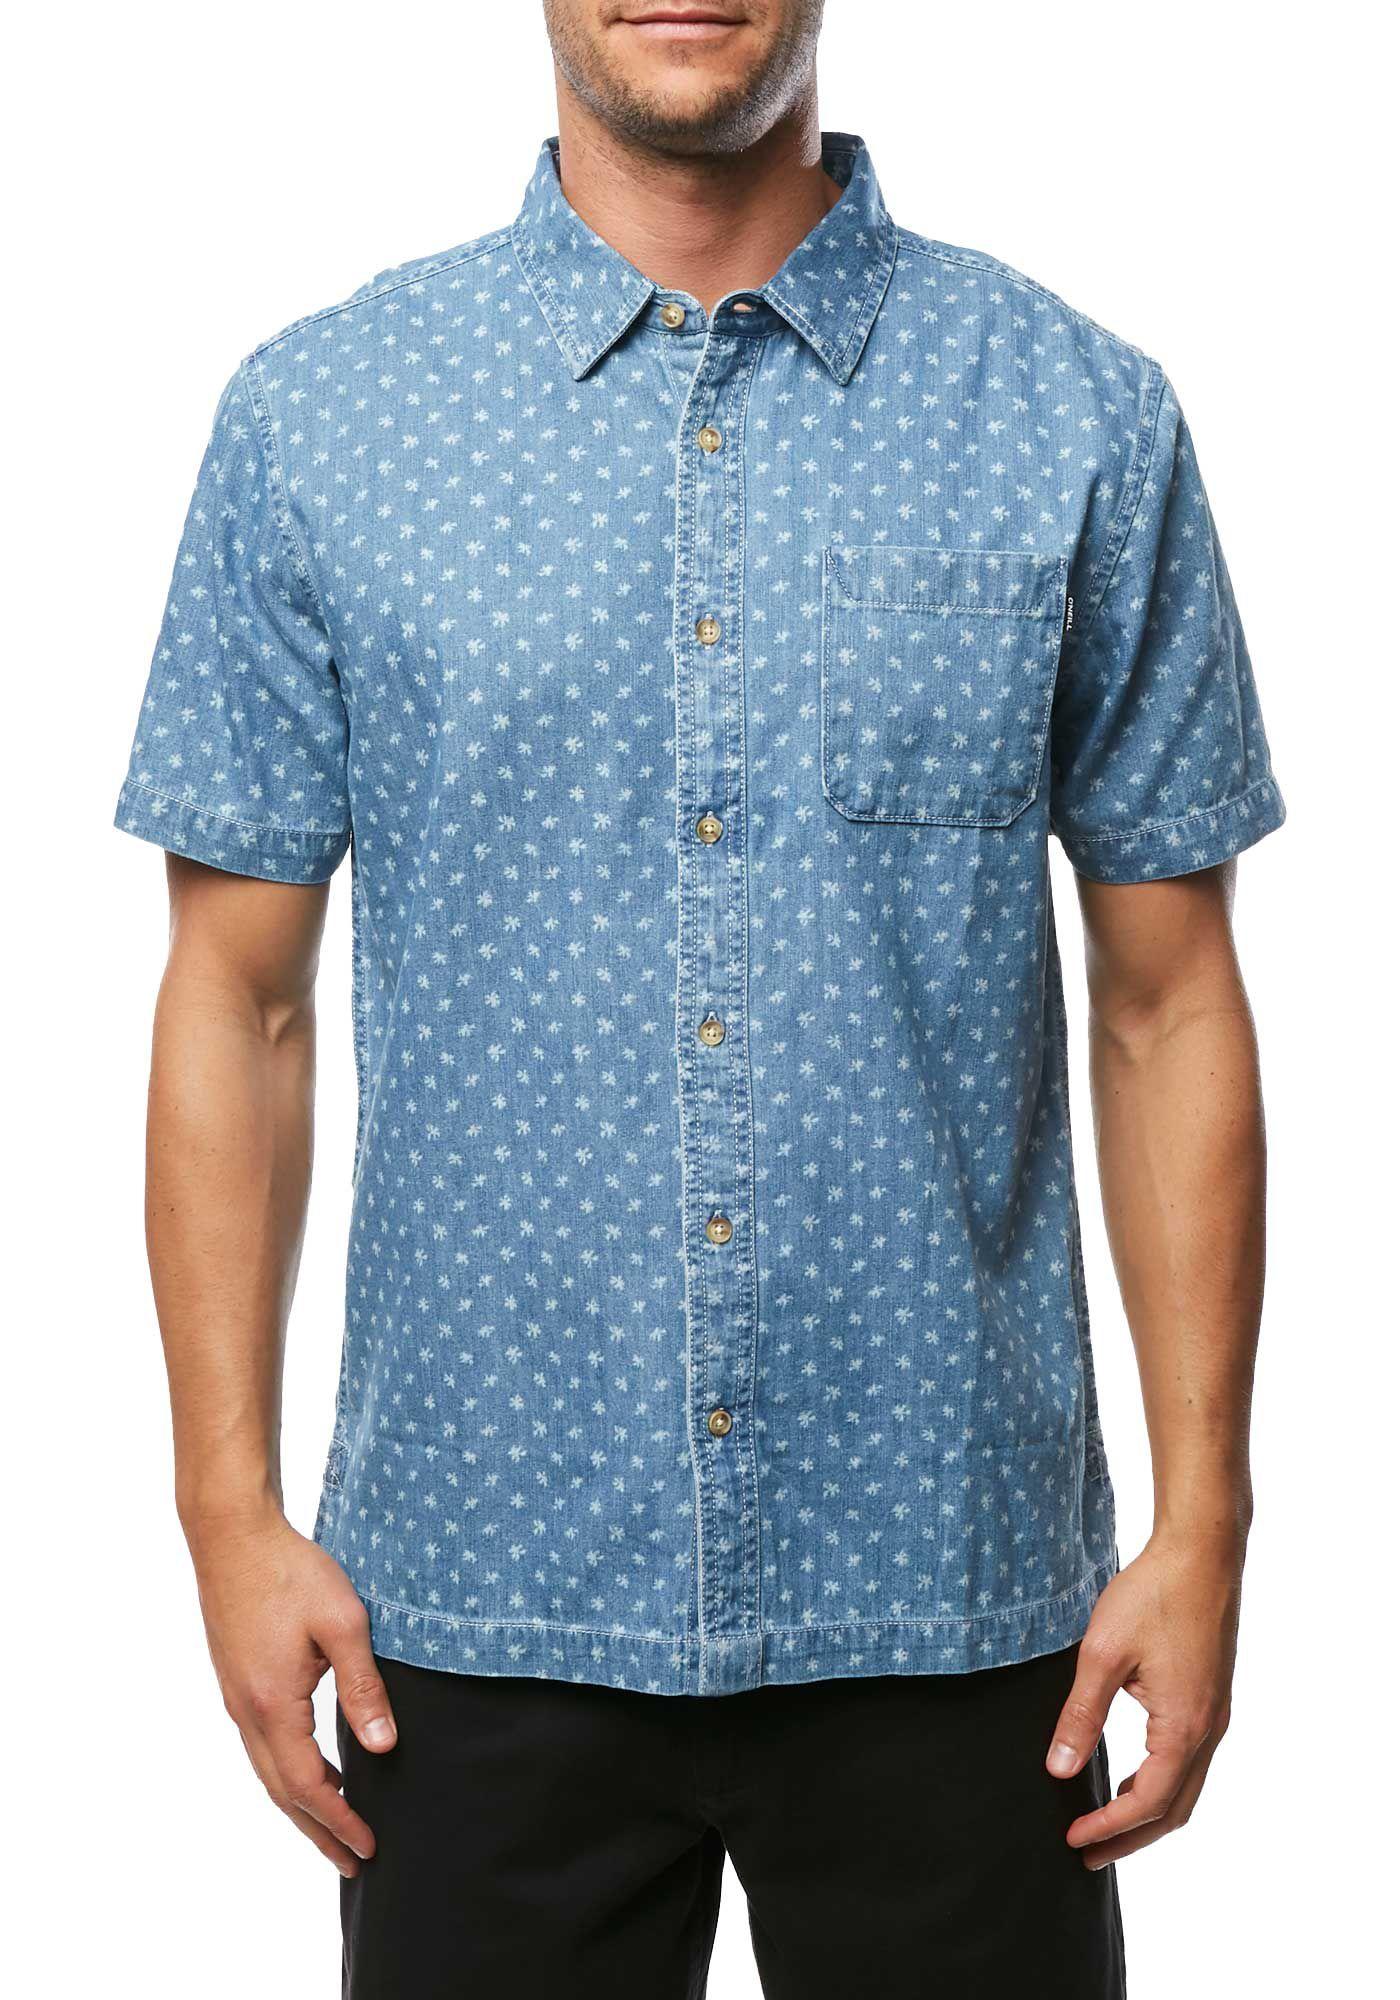 O'Neill Men's Palm Brawl Short Sleeve Shirt